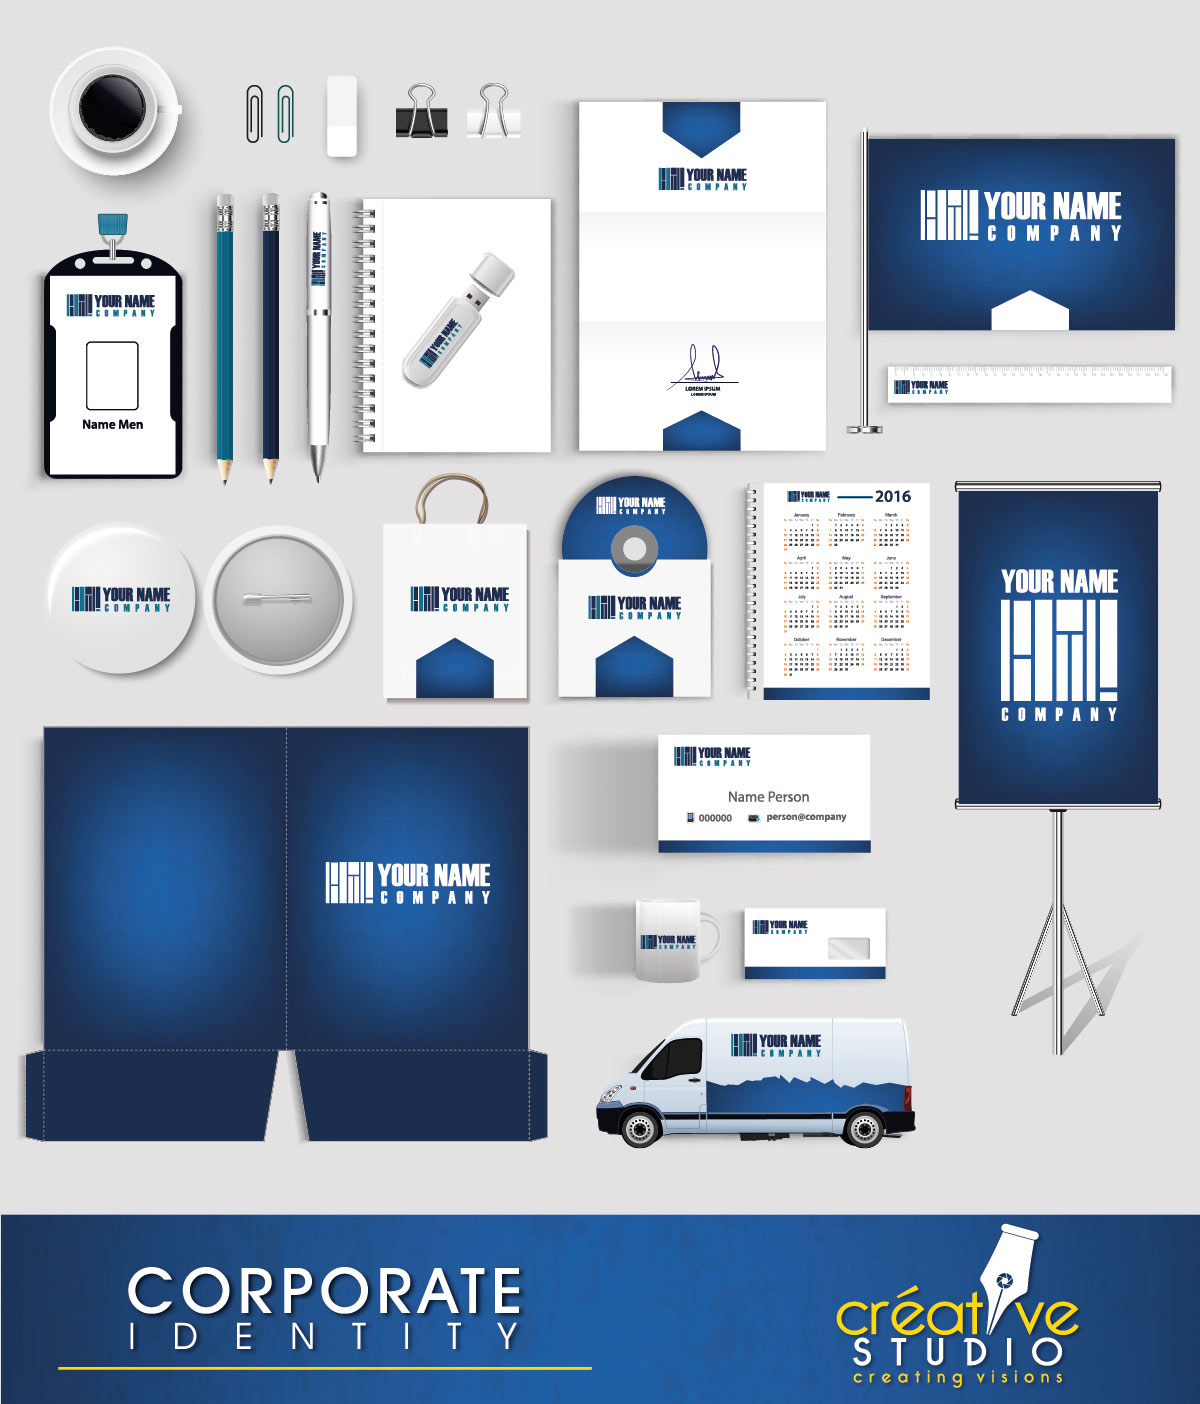 Corporate Identity 7 - Corporate Identity